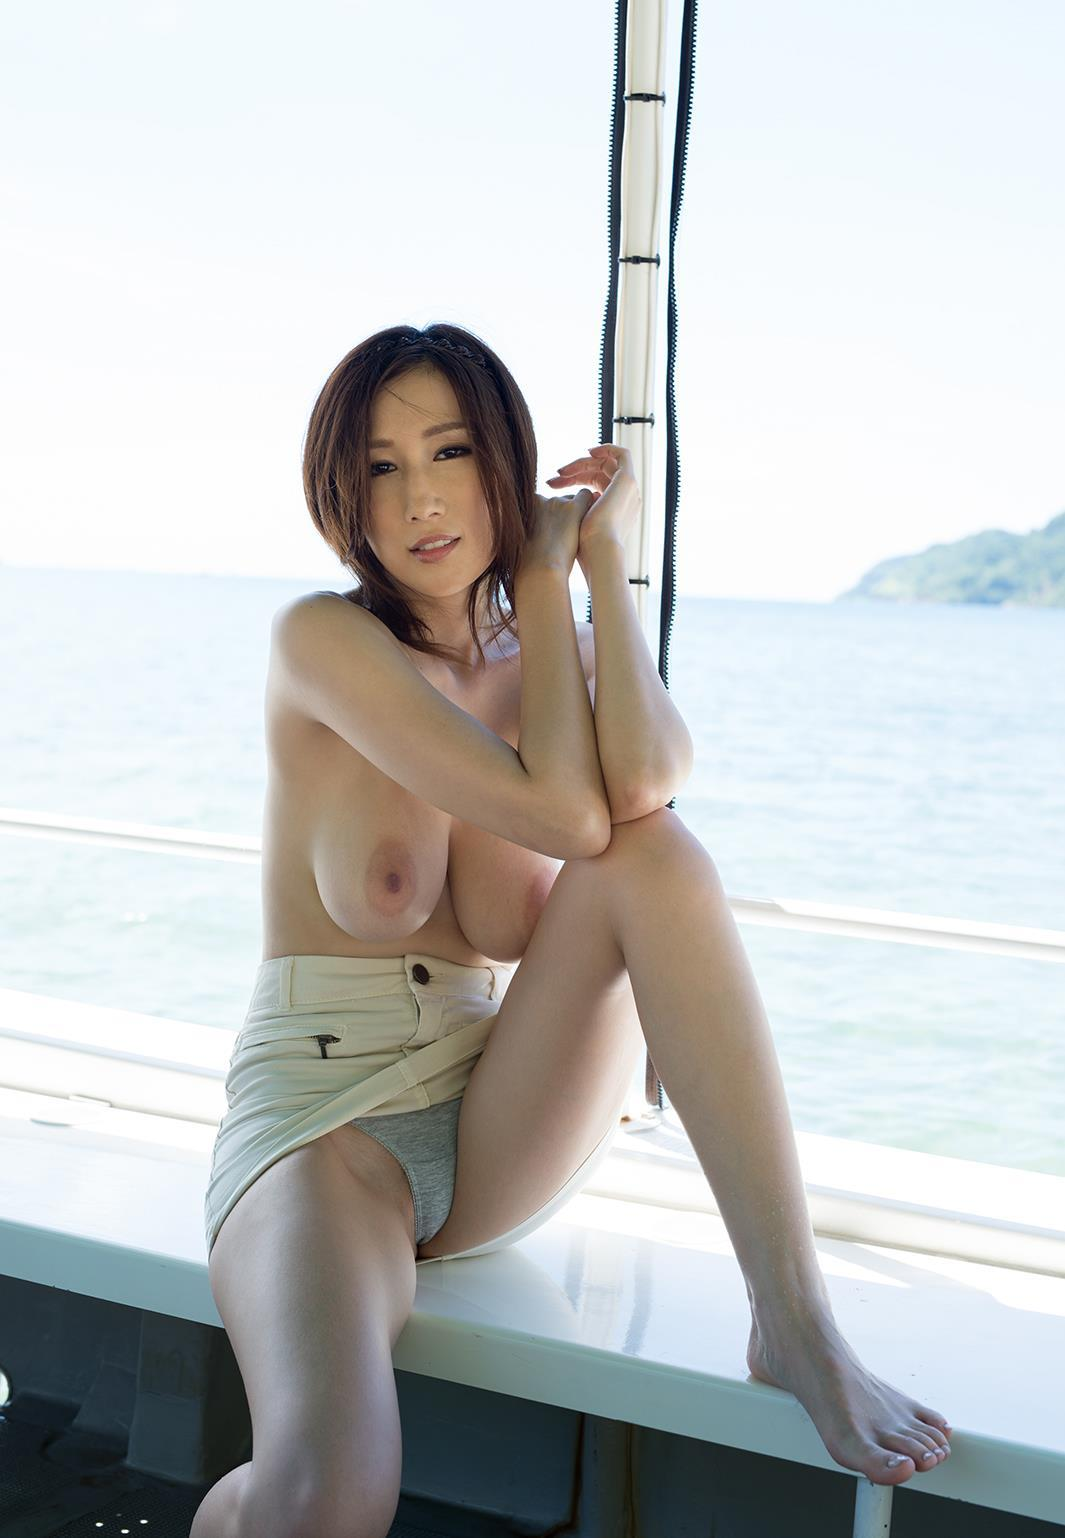 AV女優・JULIA(ジュリア) ヌード画像 66